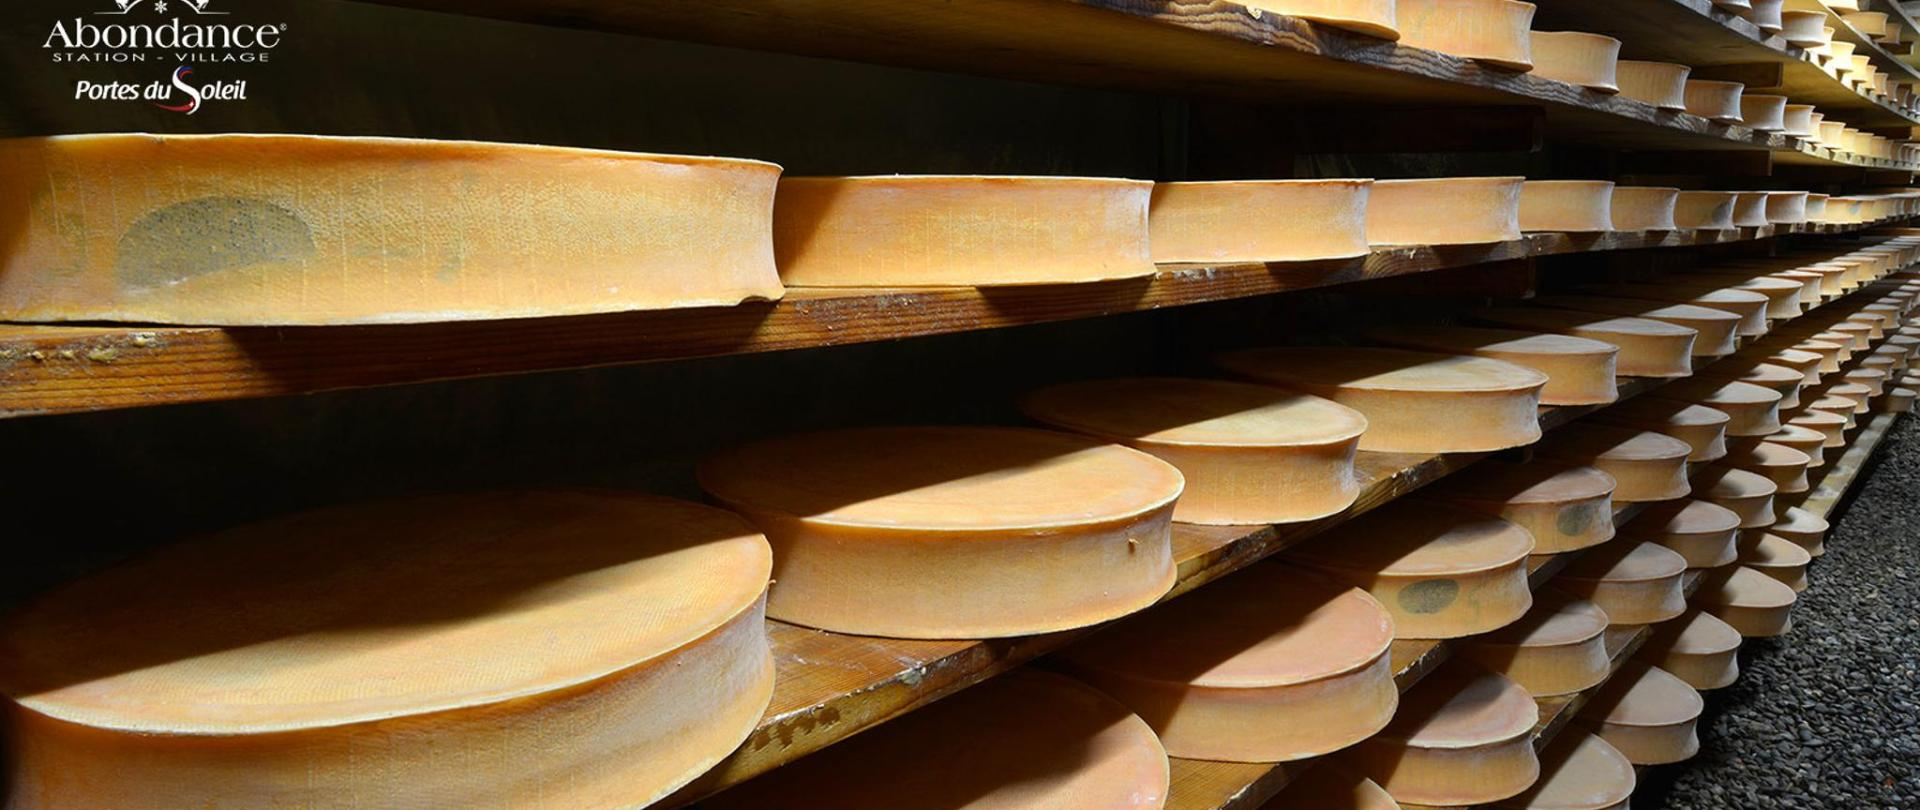 fromage-abondance-girard-08.jpg